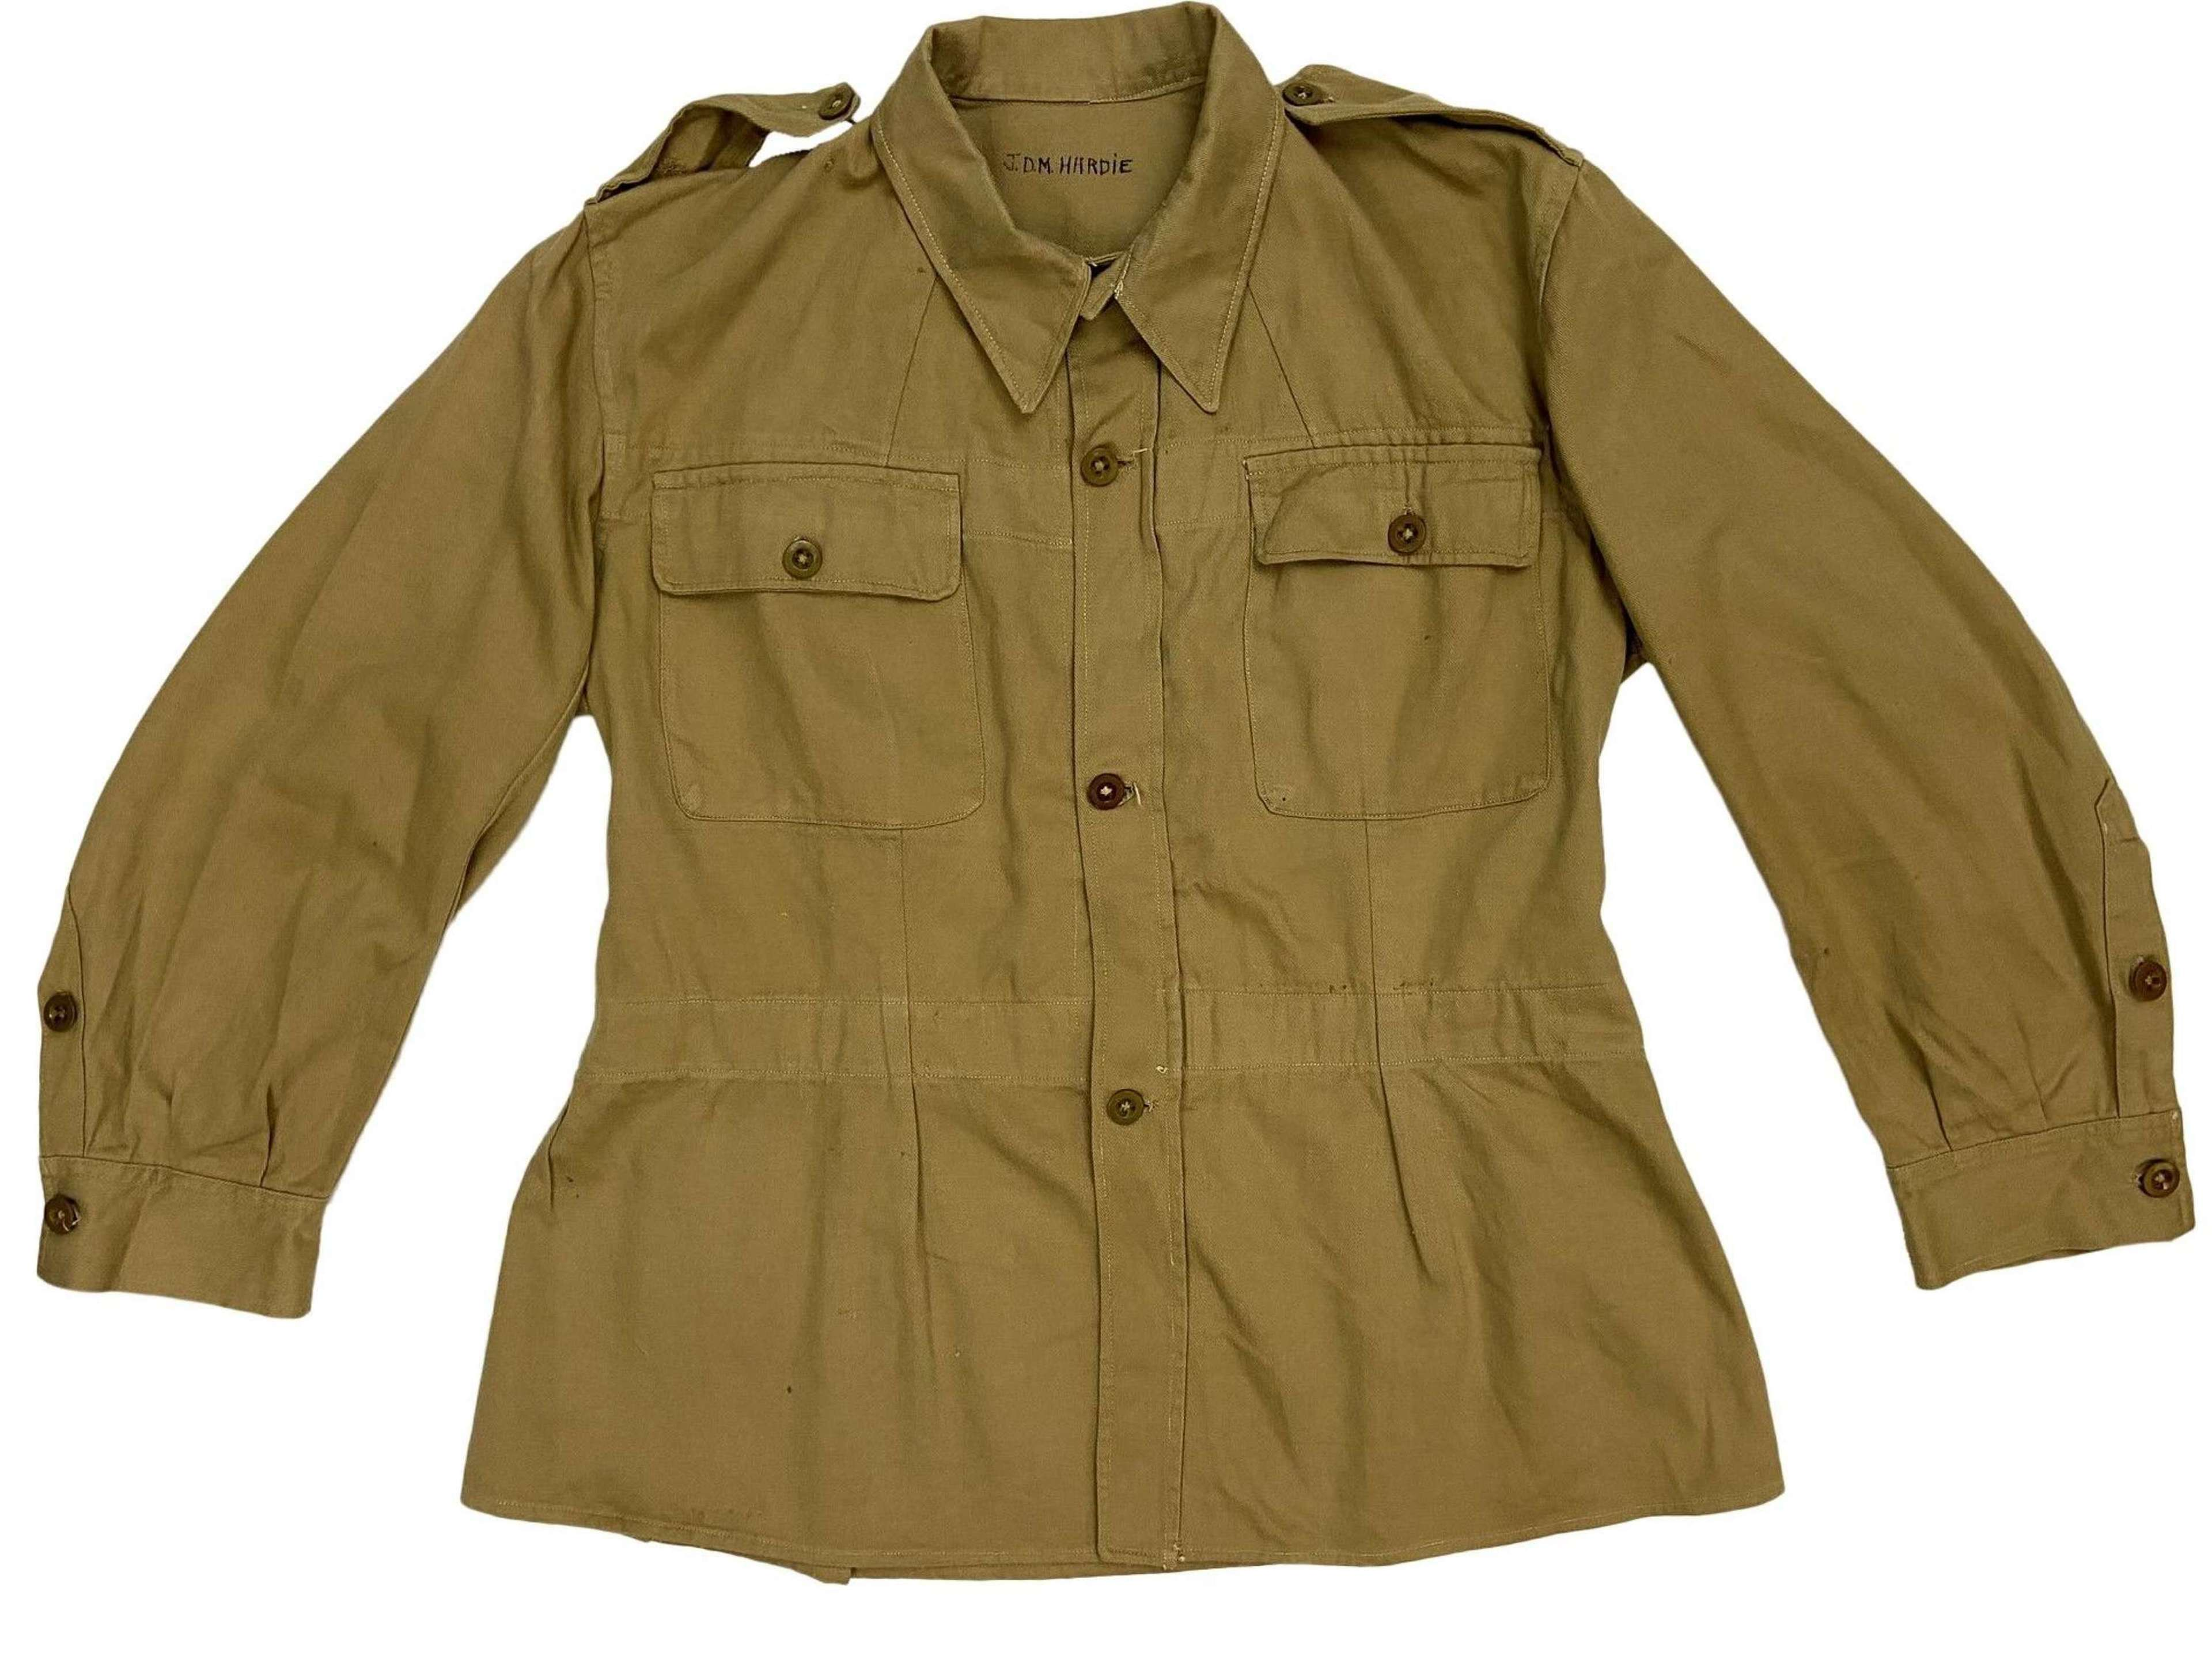 Original 1945 Dated Indian Made Cotton Drill Bush Jacket